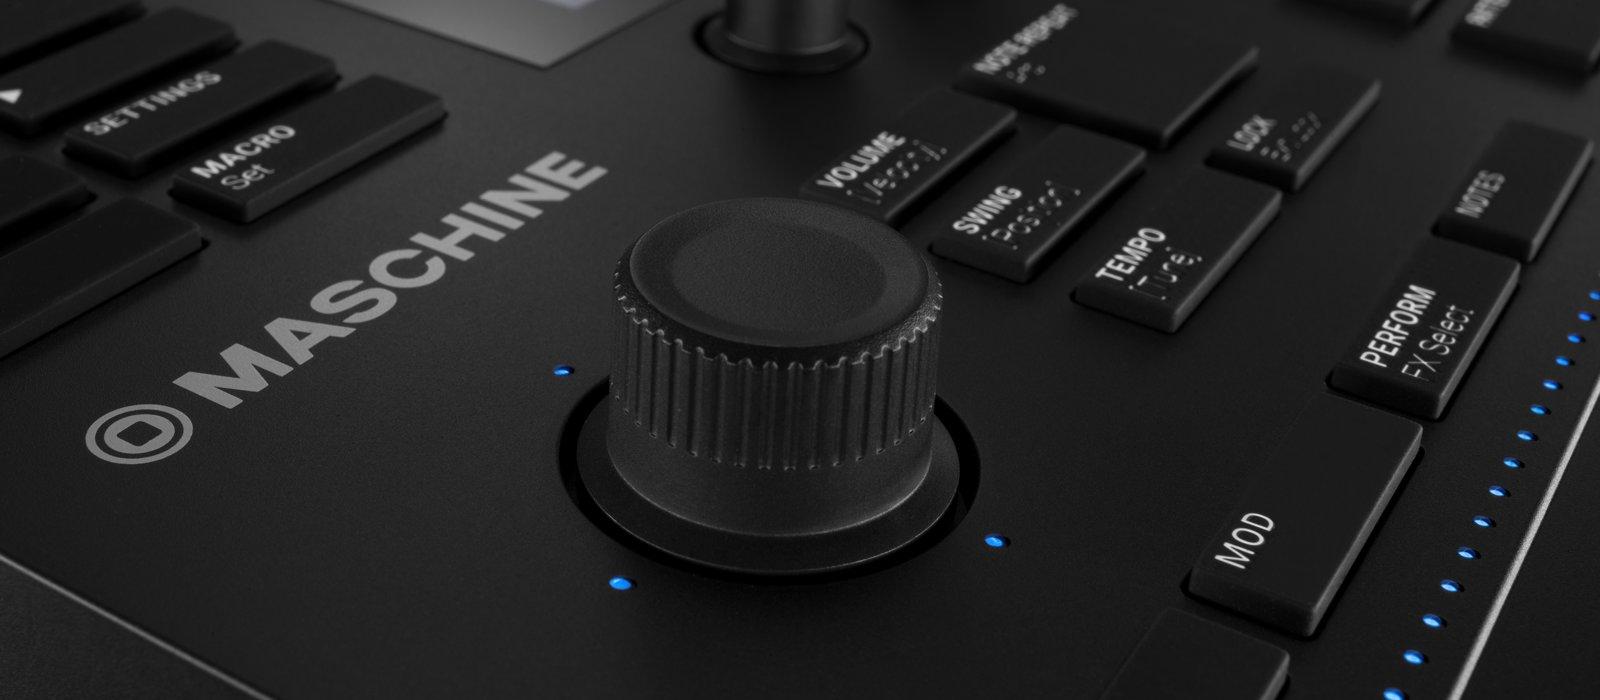 Native Instruments Maschine 2 for Mac 2.7.6 破解版 - 高品质声音集成采样器